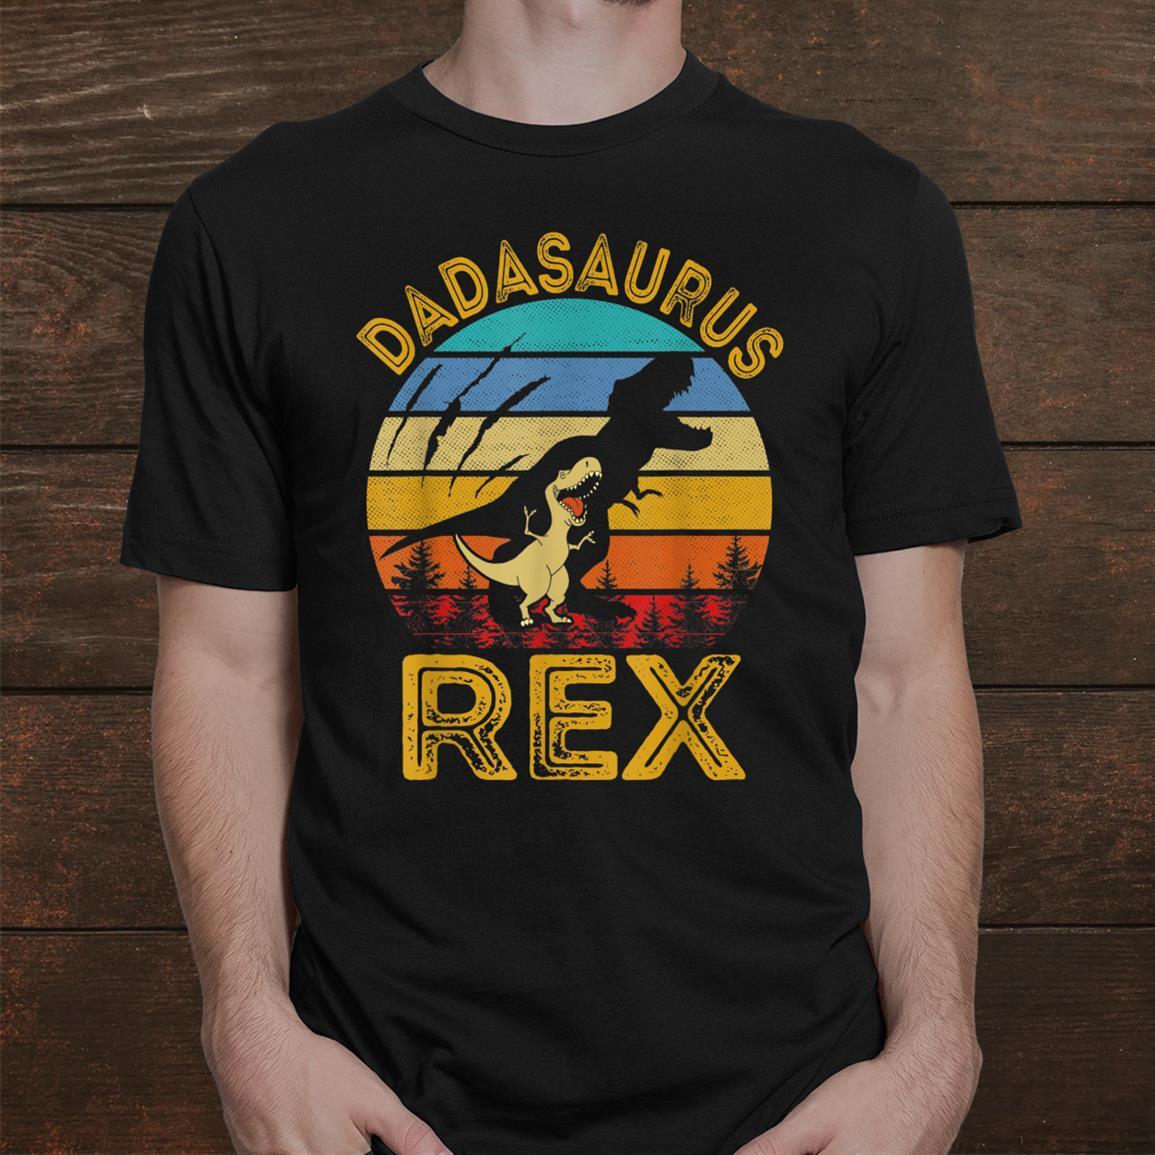 Dadasaurus Rex Shirt Funny Dinosaur Shirt